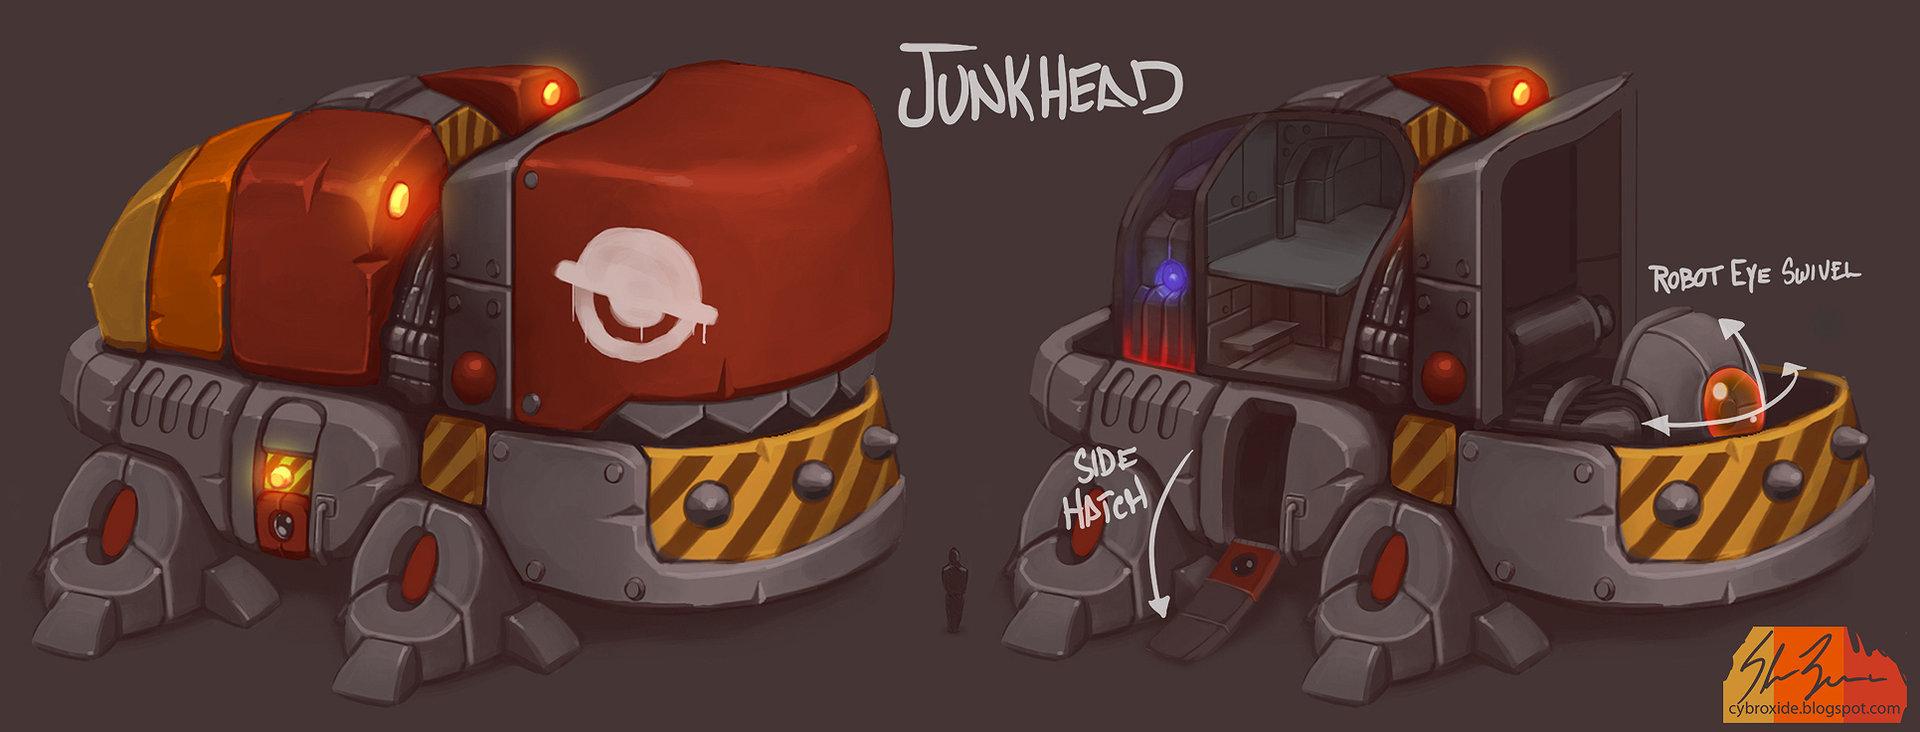 The Junk Head